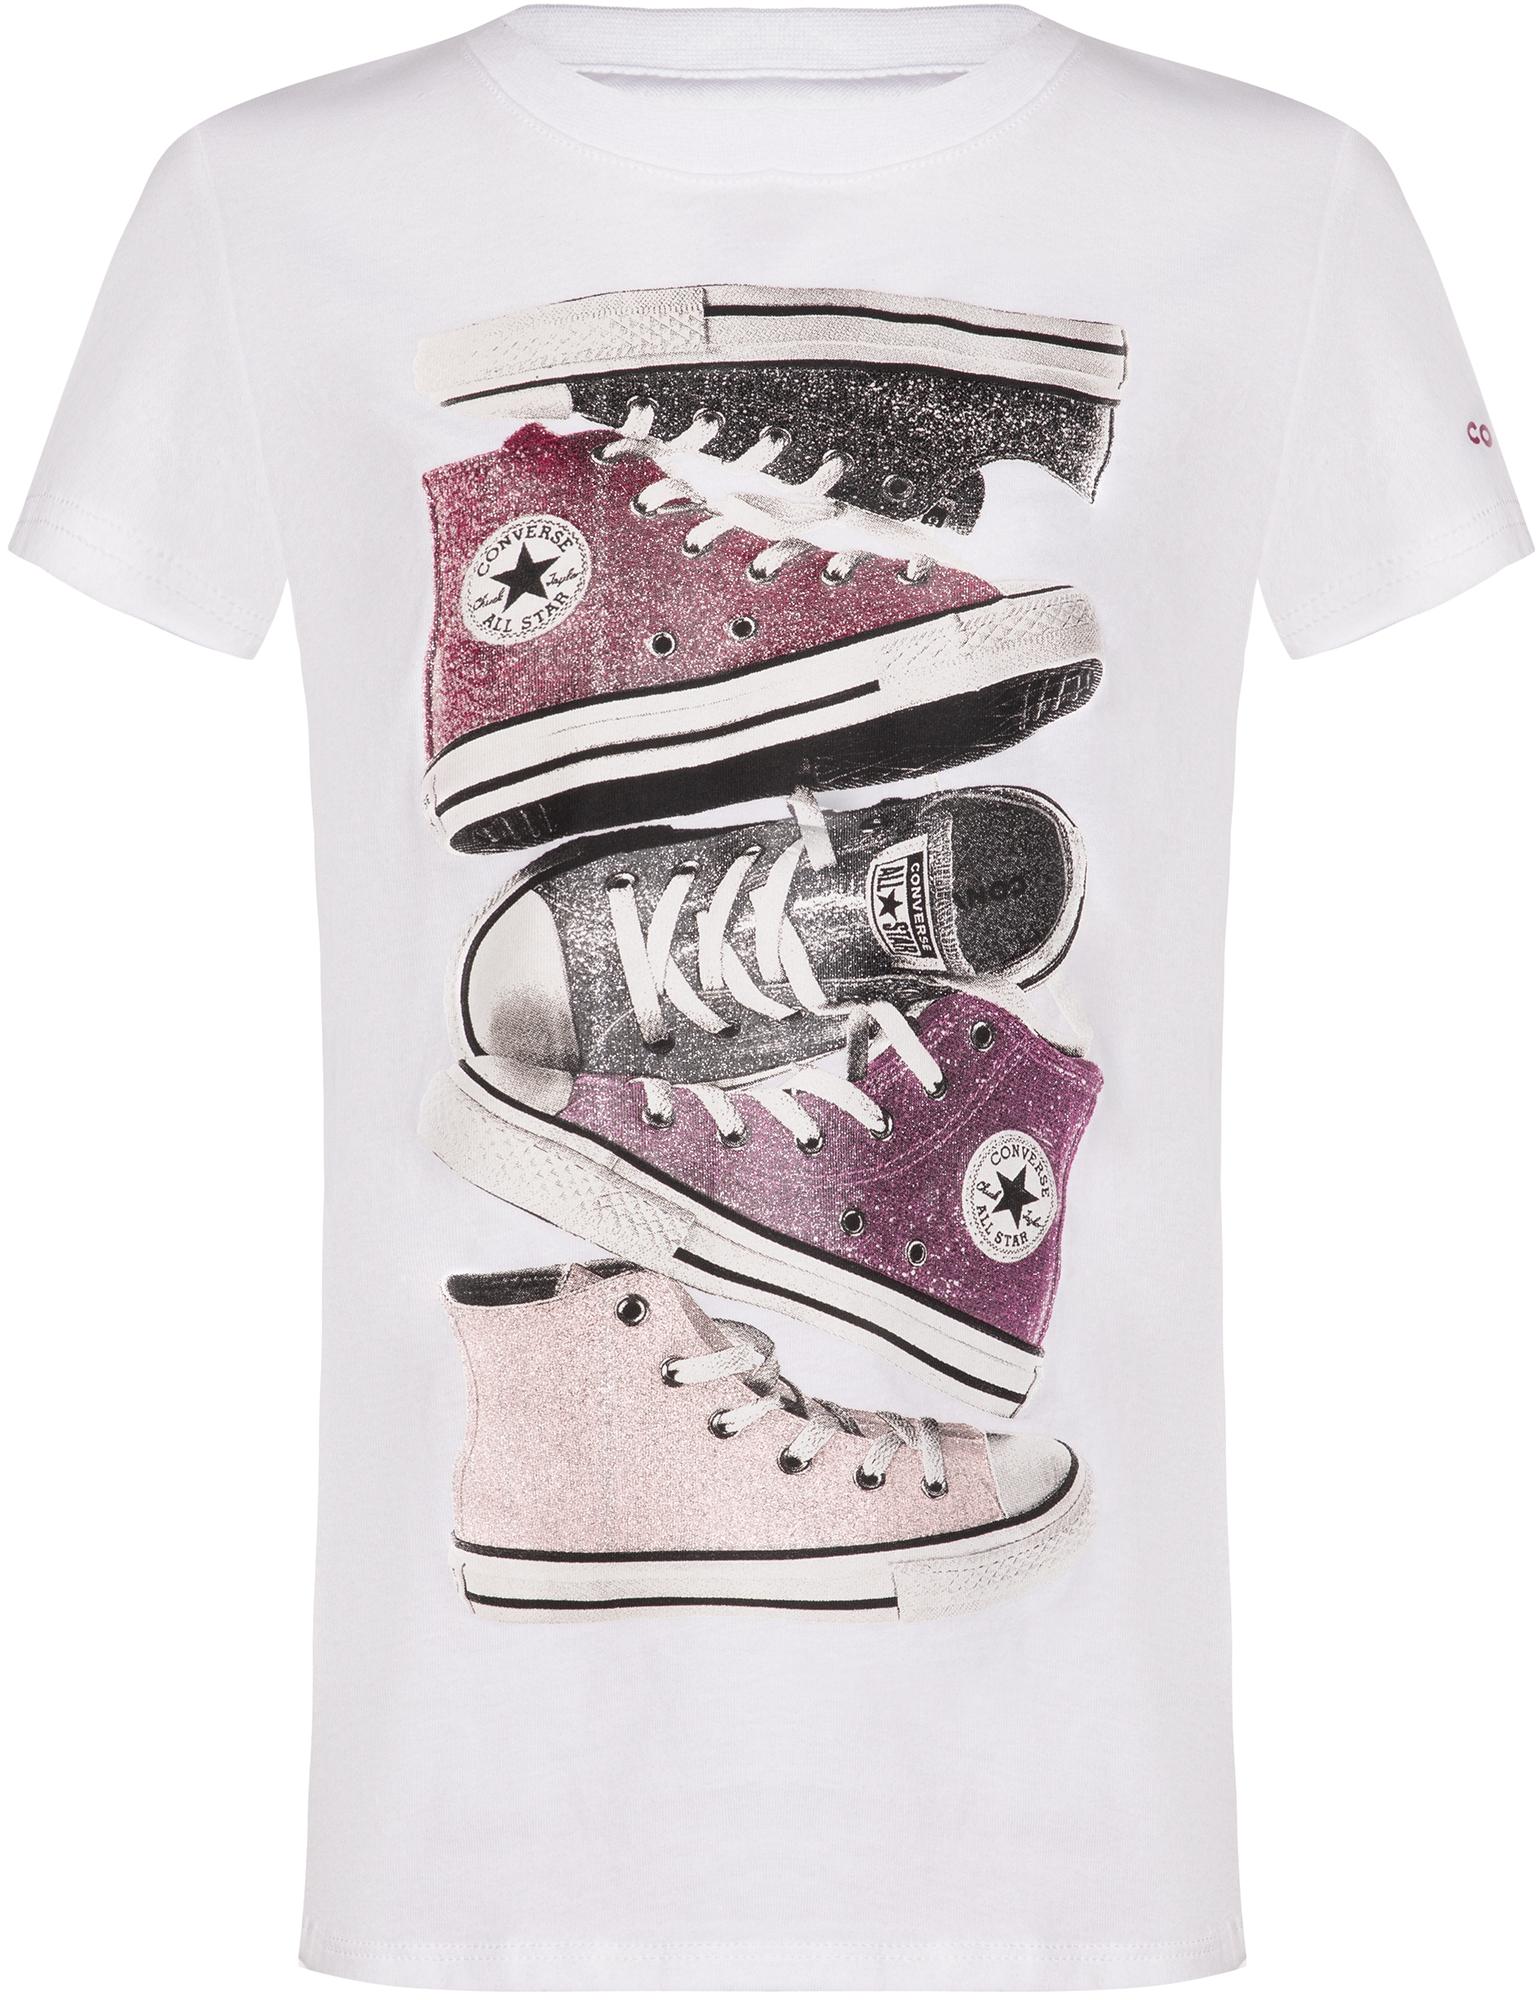 Фото - Converse Футболка для девочек Converse Shiny Sneaker Stack Tee, размер 140 футболка converse tilted star chevron tee